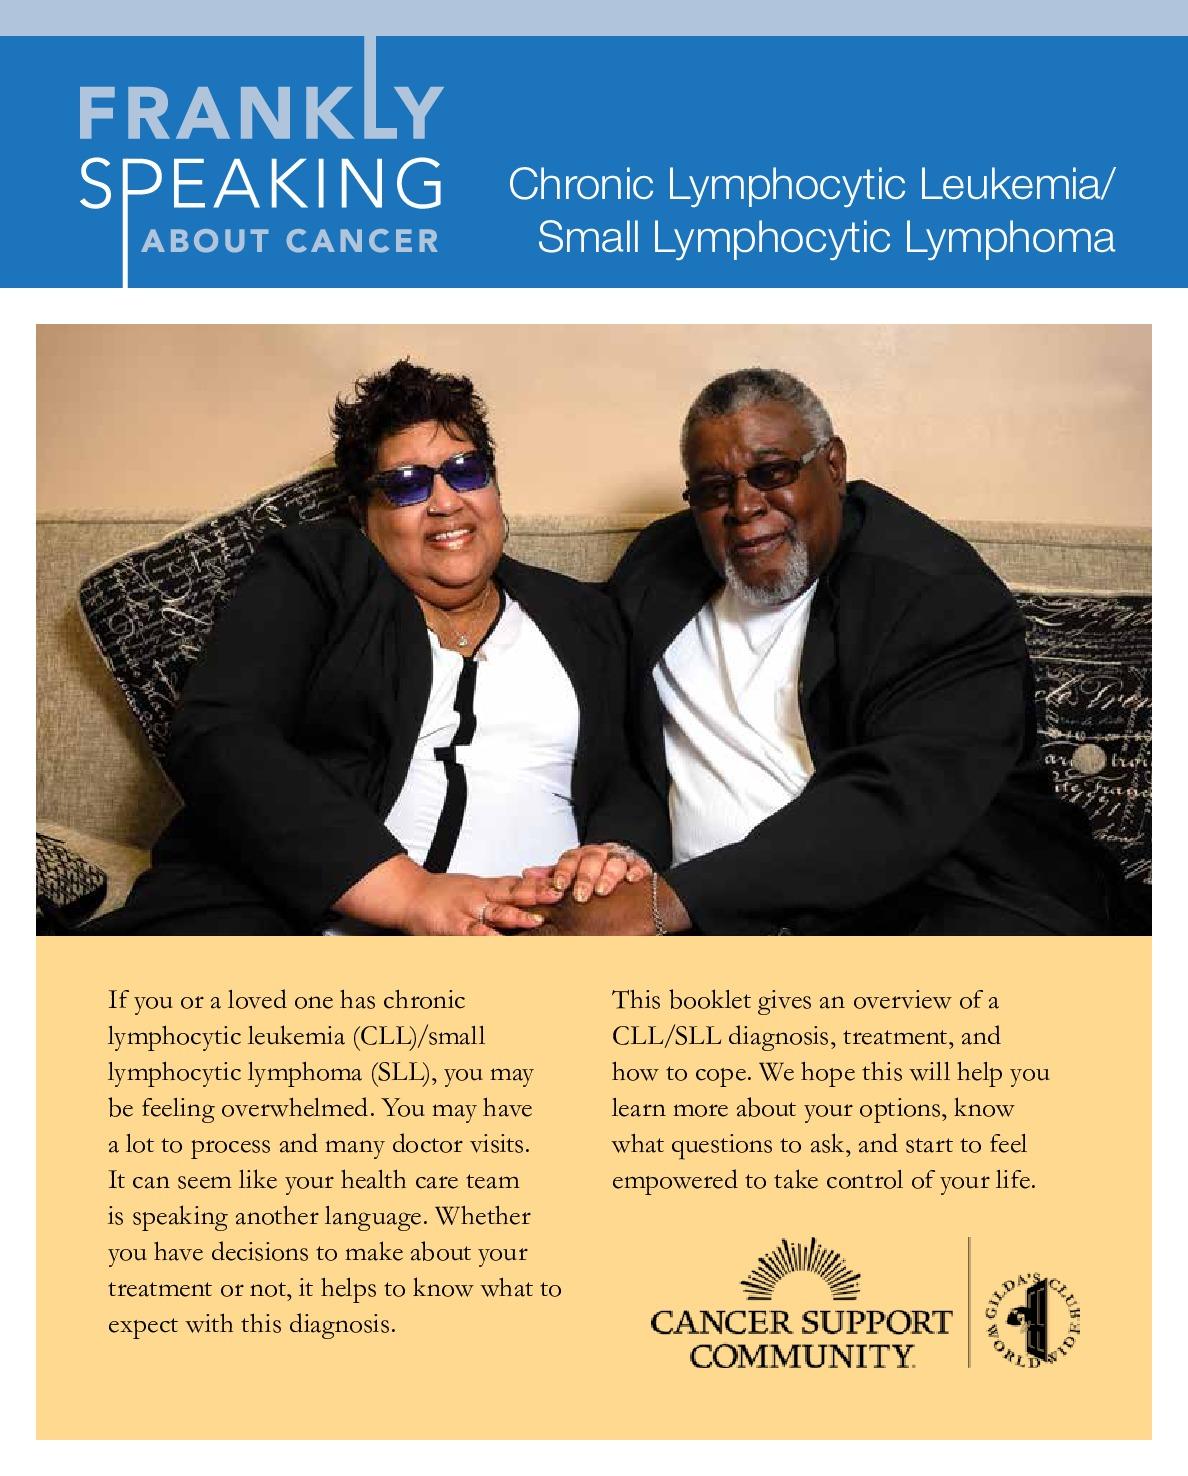 Chronic Lymphocytic Leukemia/Small Lymphocytic Lymphoma